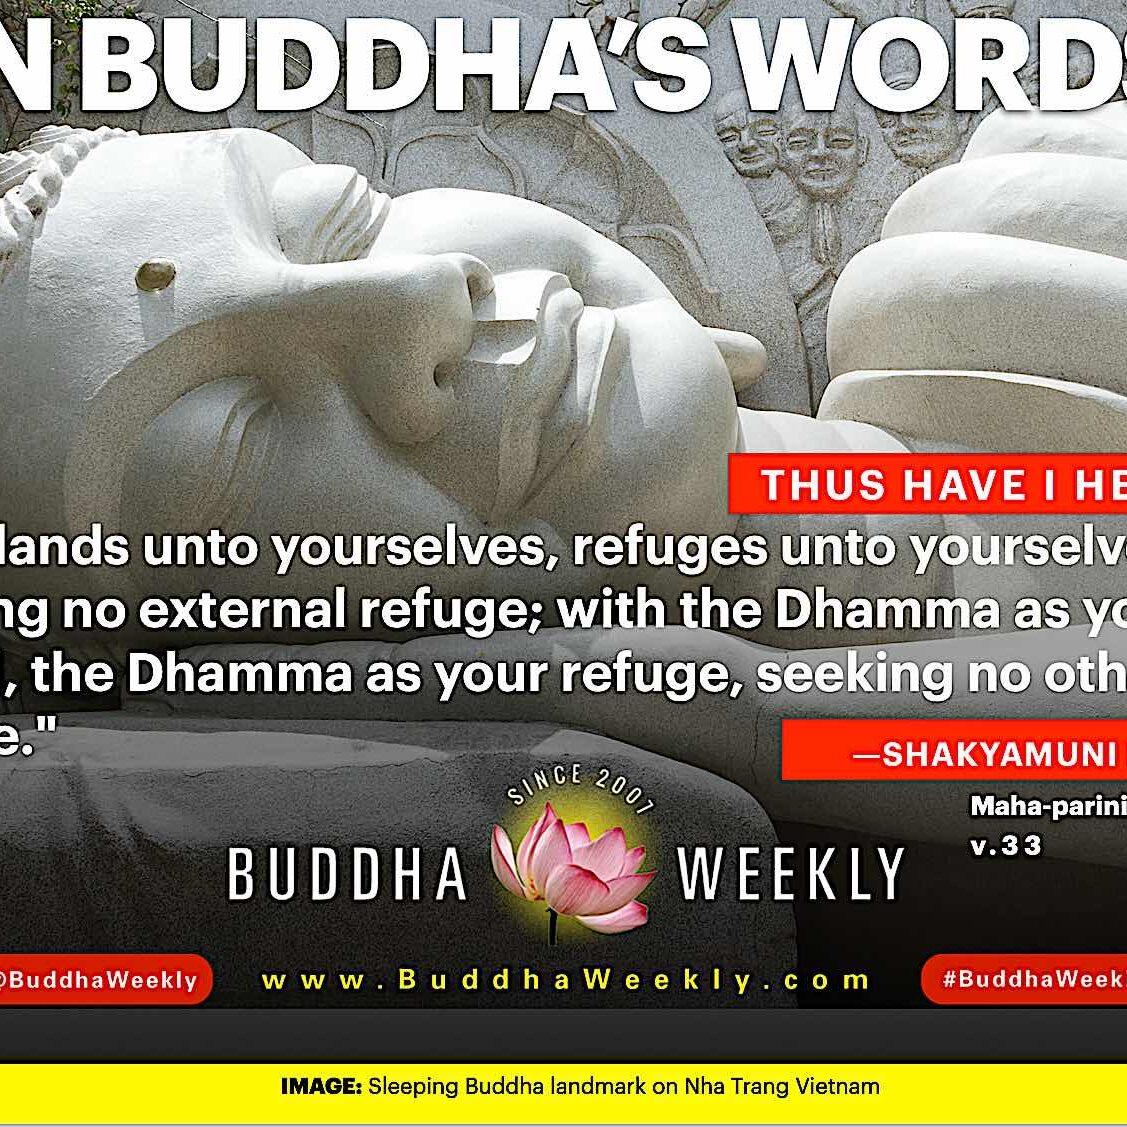 "In Buddha's Words 2: ""Be islands unto yourselves, refuges unto yourselves, seeking no external refuge; with the Dhamma as your island, the Dhamma as your refuge, seeking no other refuge."" Cited from Maha-parinibbana Sutta v.33"